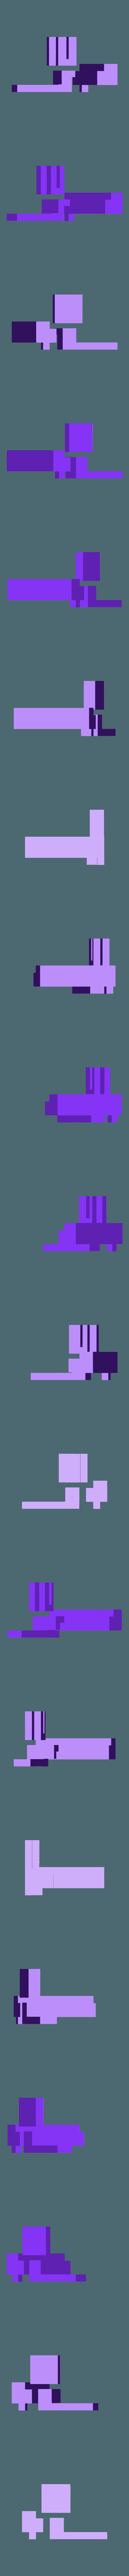 Orange_Parts_80.stl Download free STL file 8 bits style Bubble Bobble Dragon - Separate parts (no glue needed) • 3D print model, conceptify